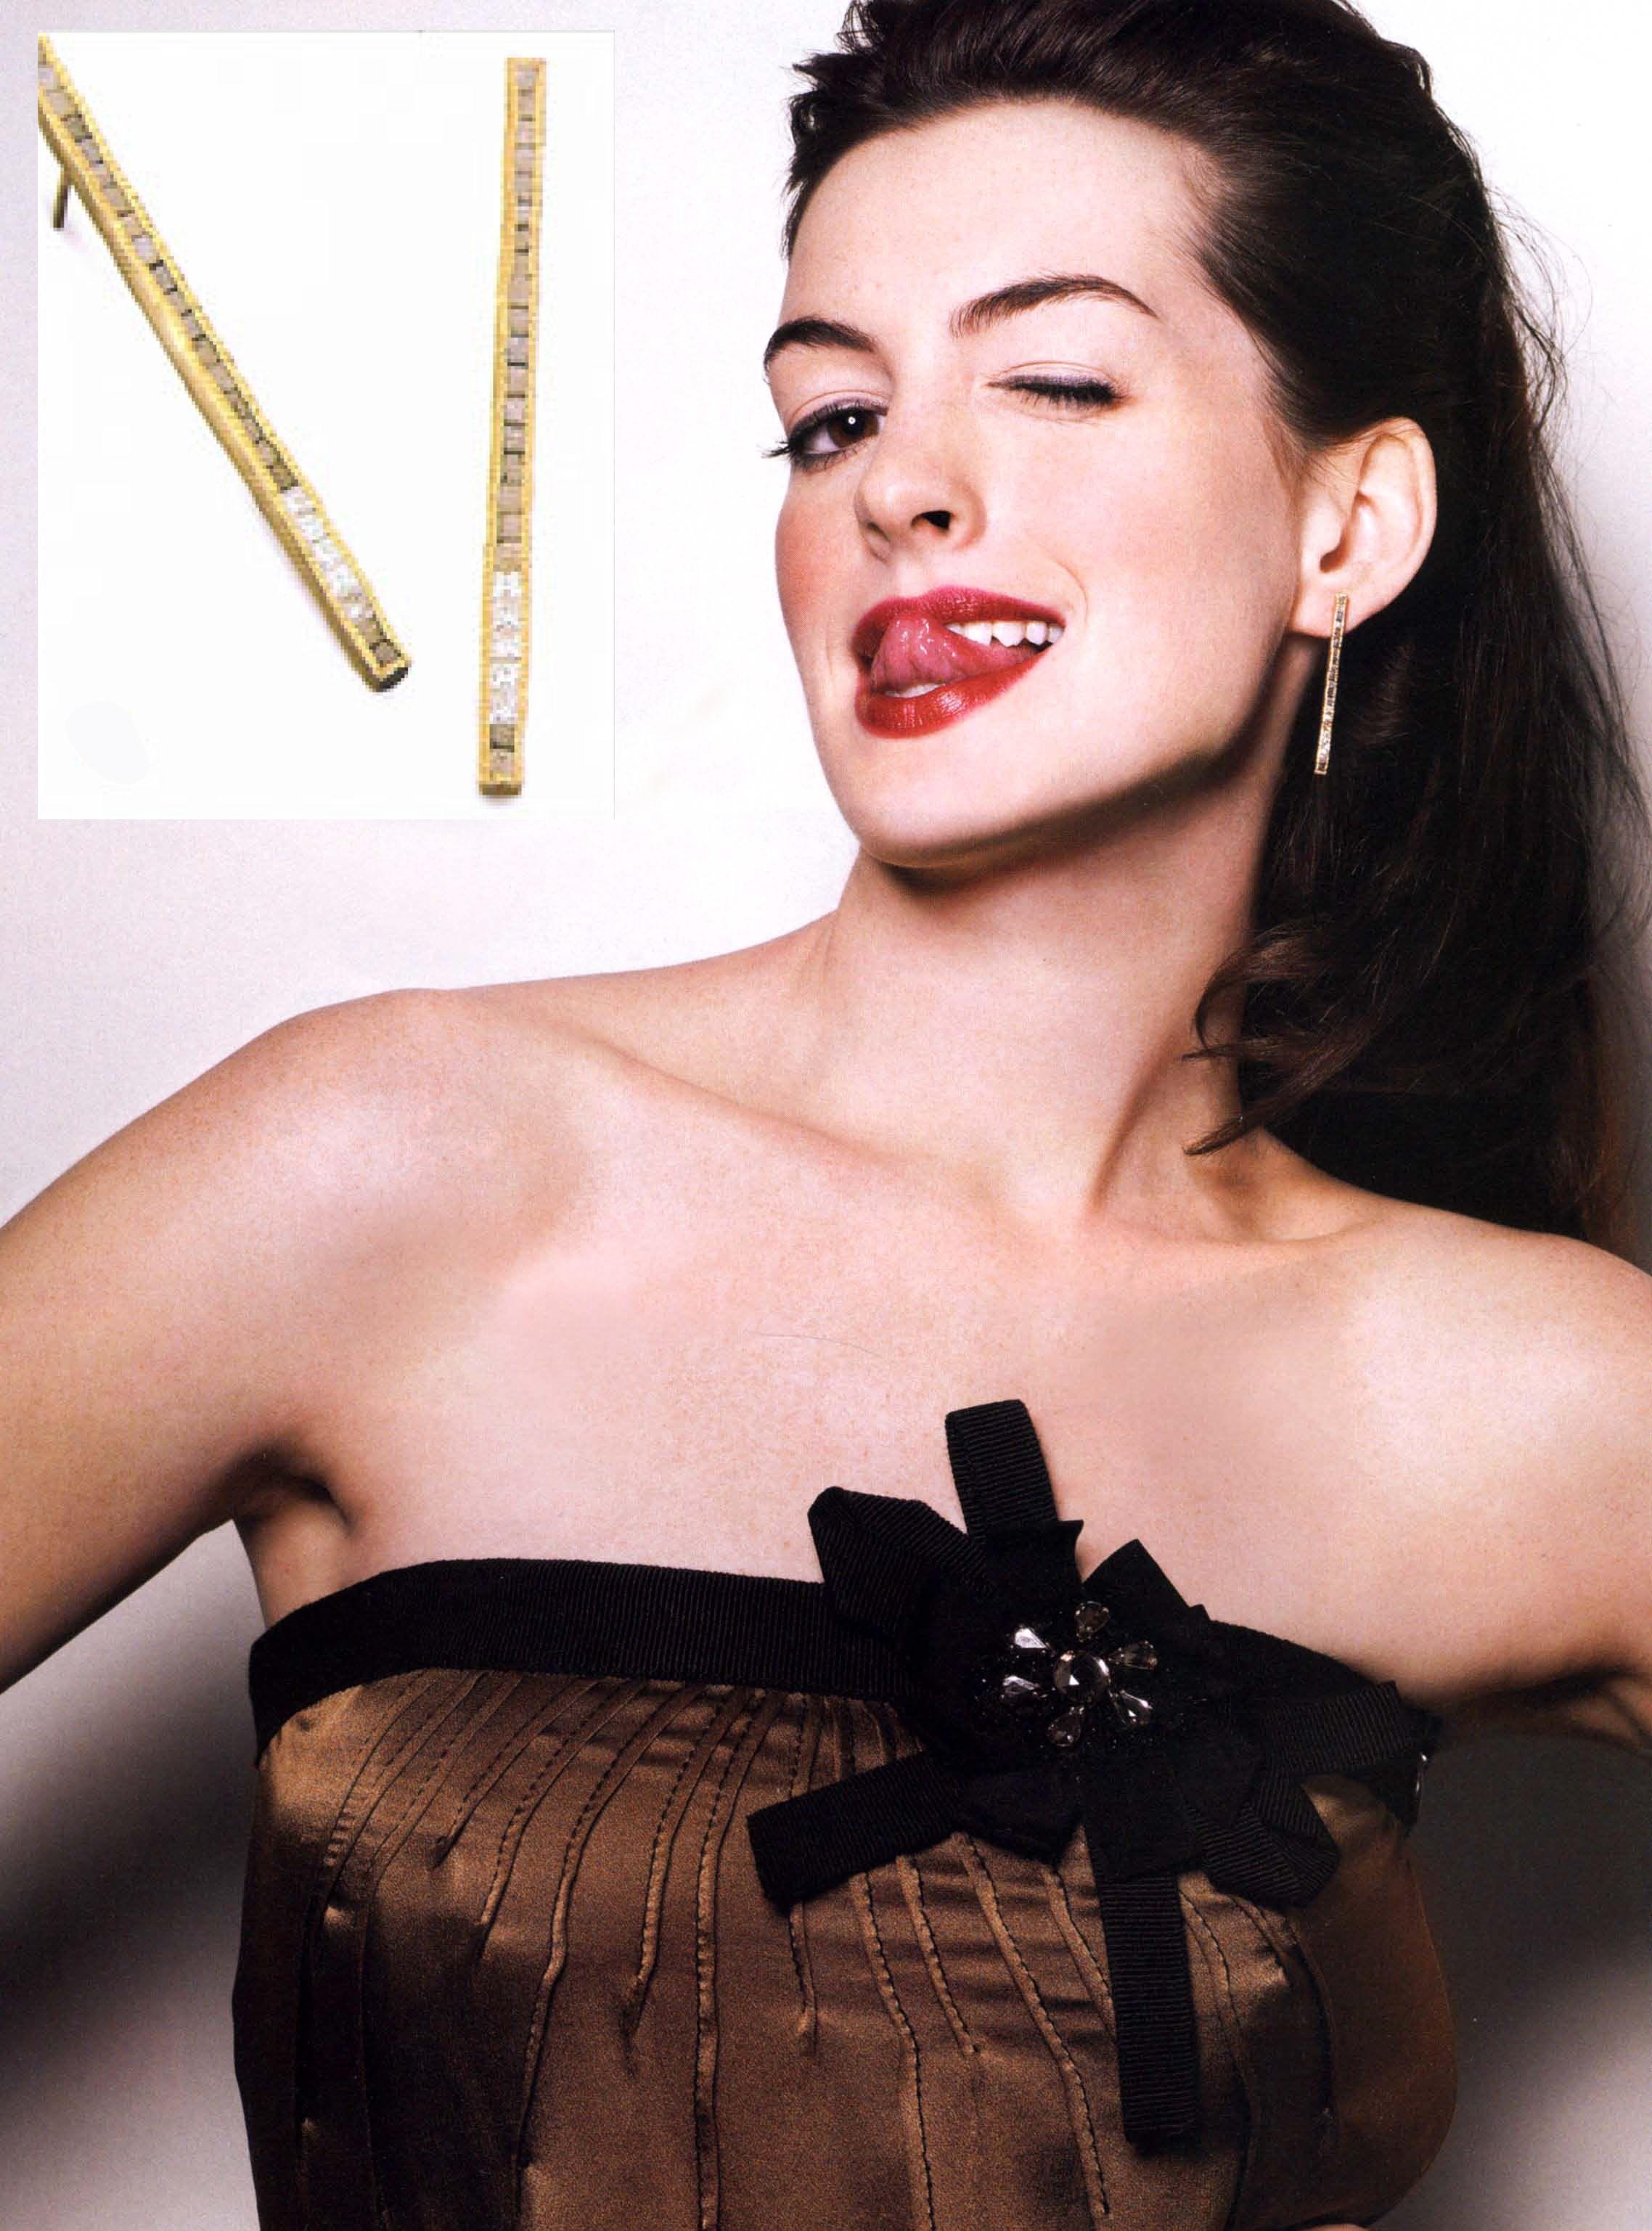 Anne Hathaway rocking Todd Reed raw diamond cube earrings in 2006 ...